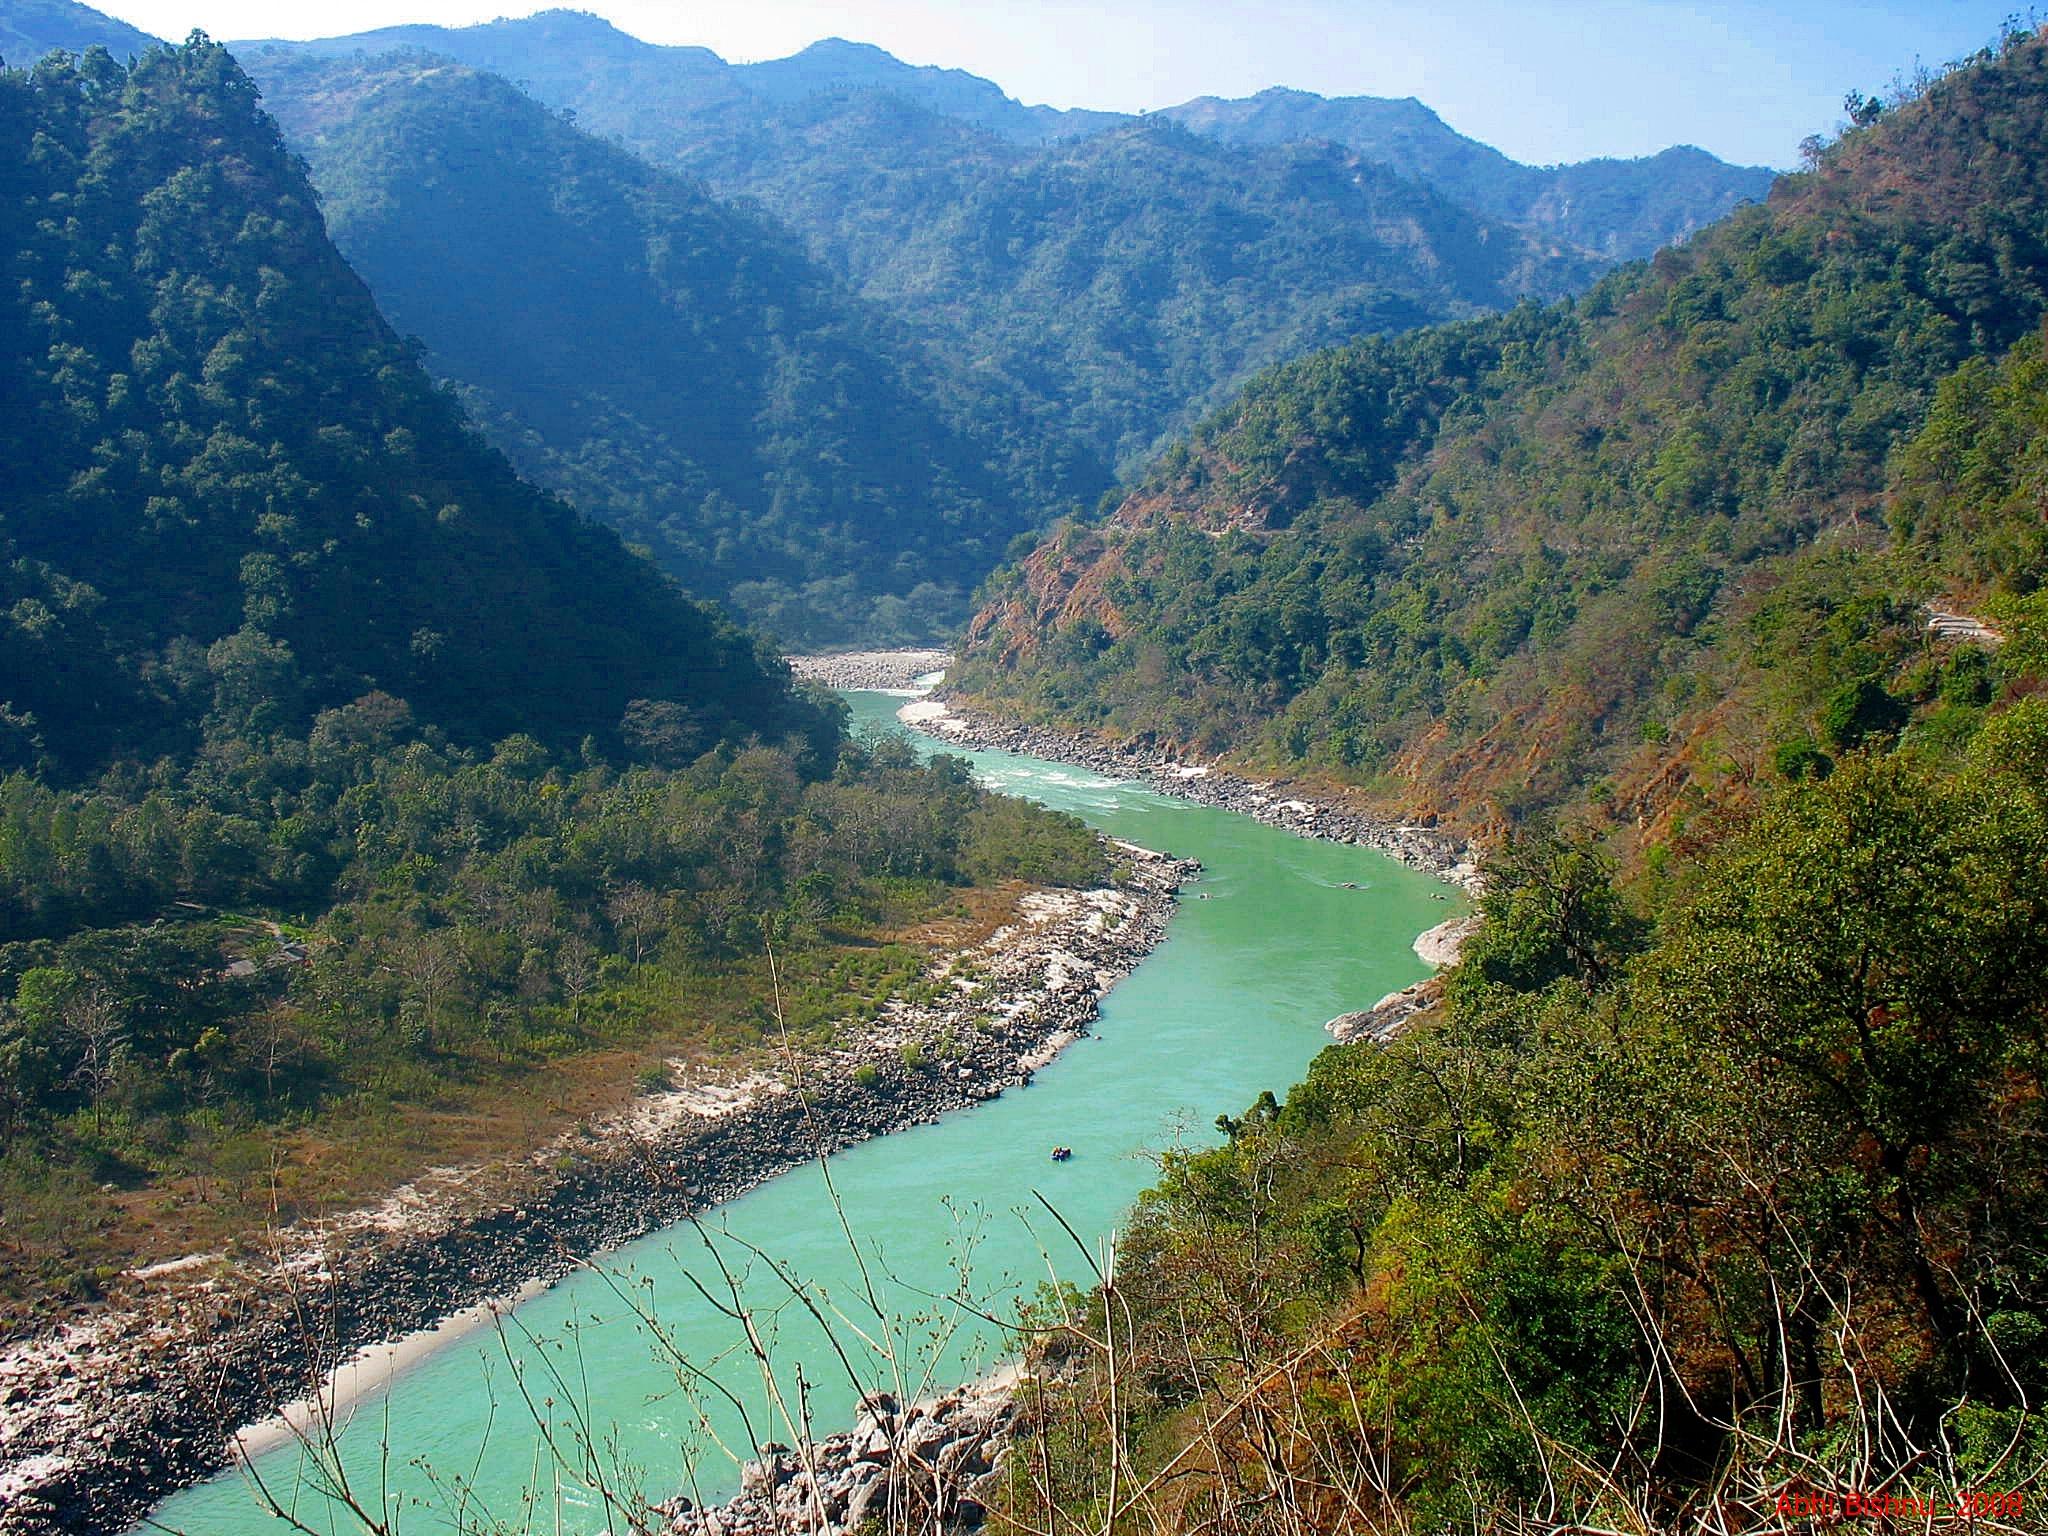 Quiet flows the Ganges...